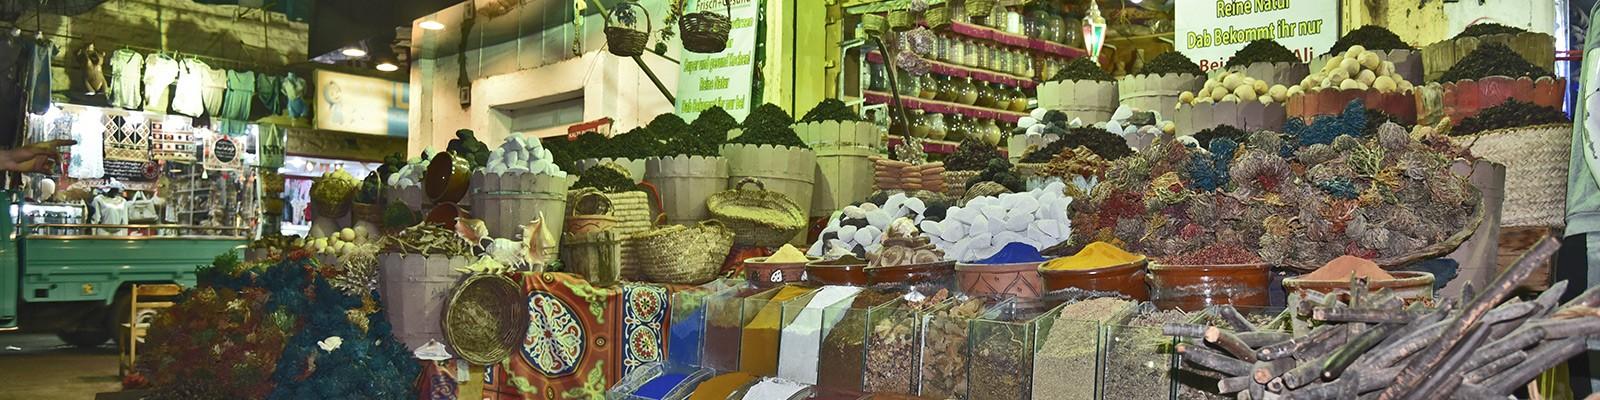 History of Hurghada